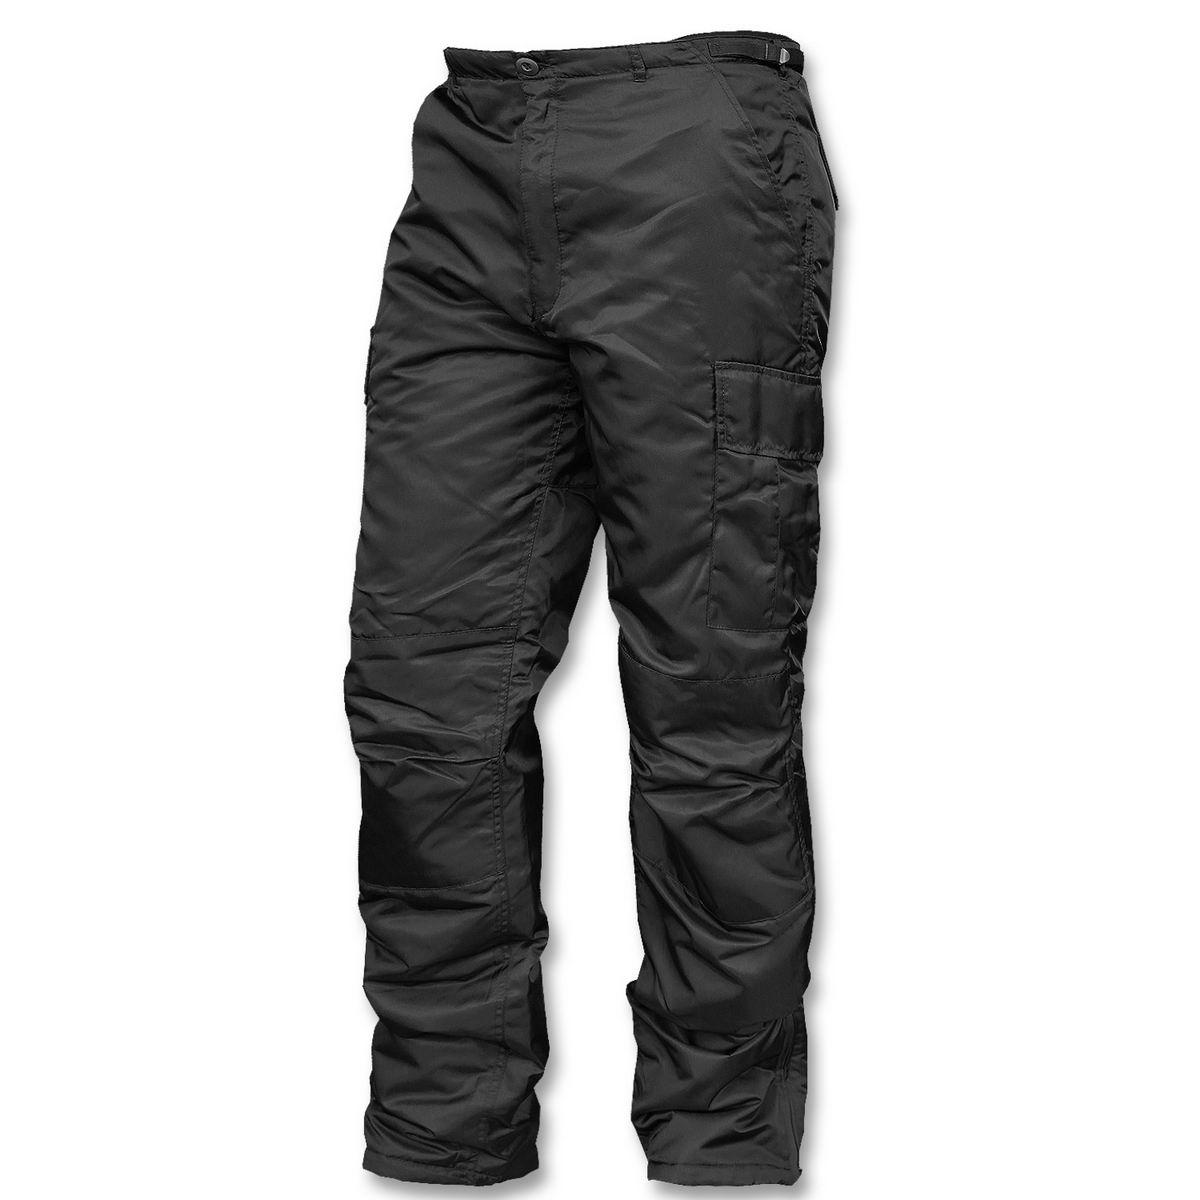 Утепленные штаны MIL-TEC US thermo MA1 nylon 5e6a041915f40